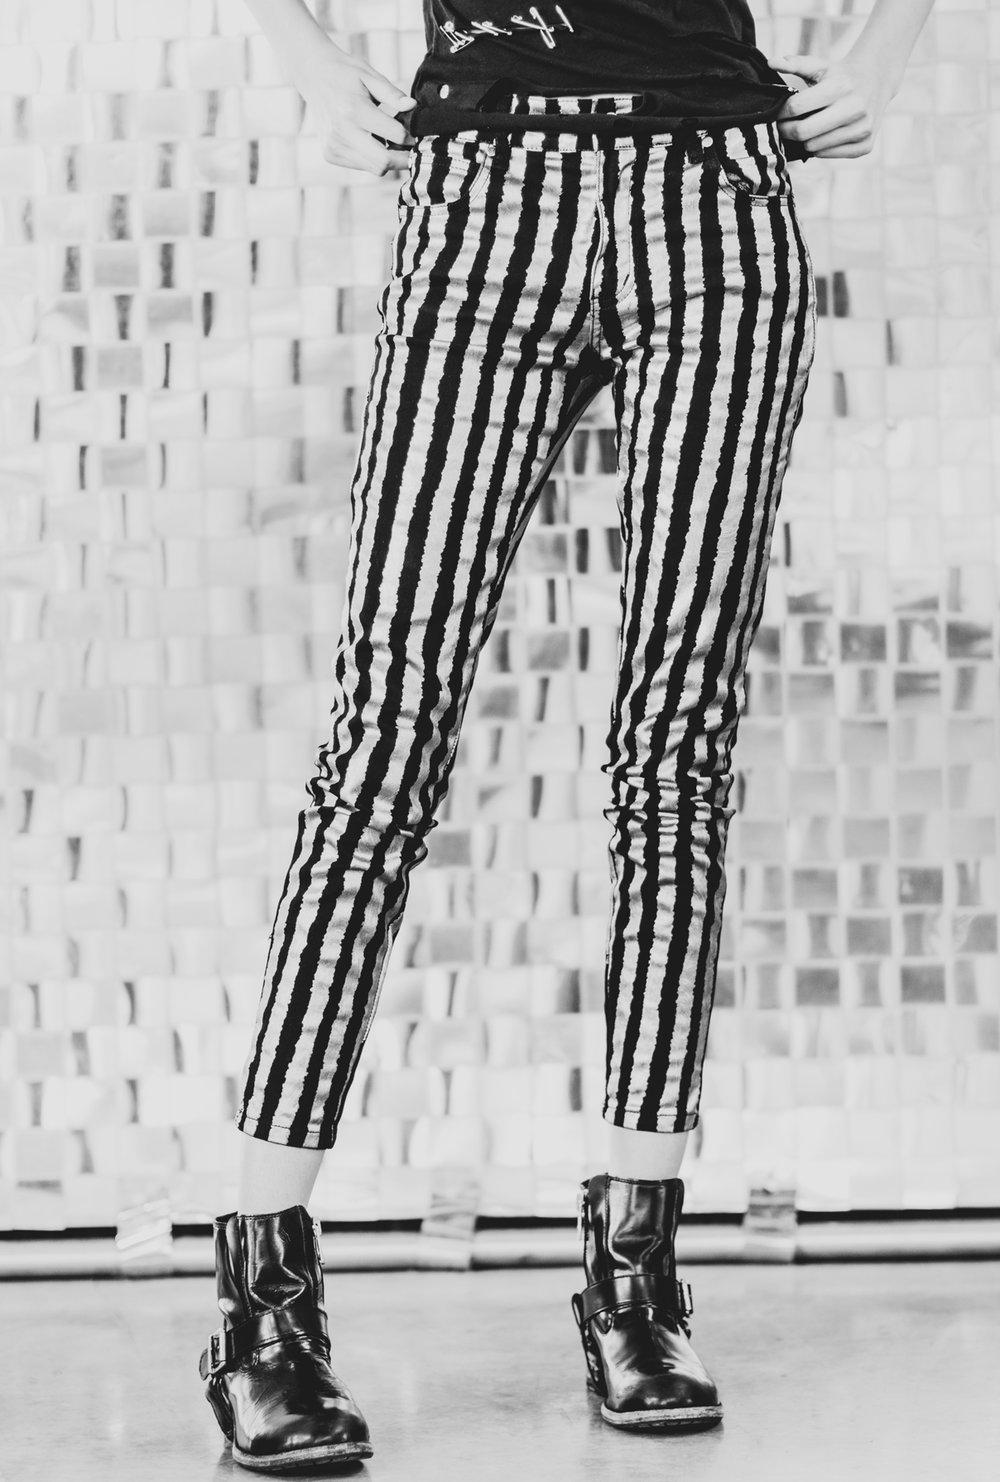 stripes1.jpg